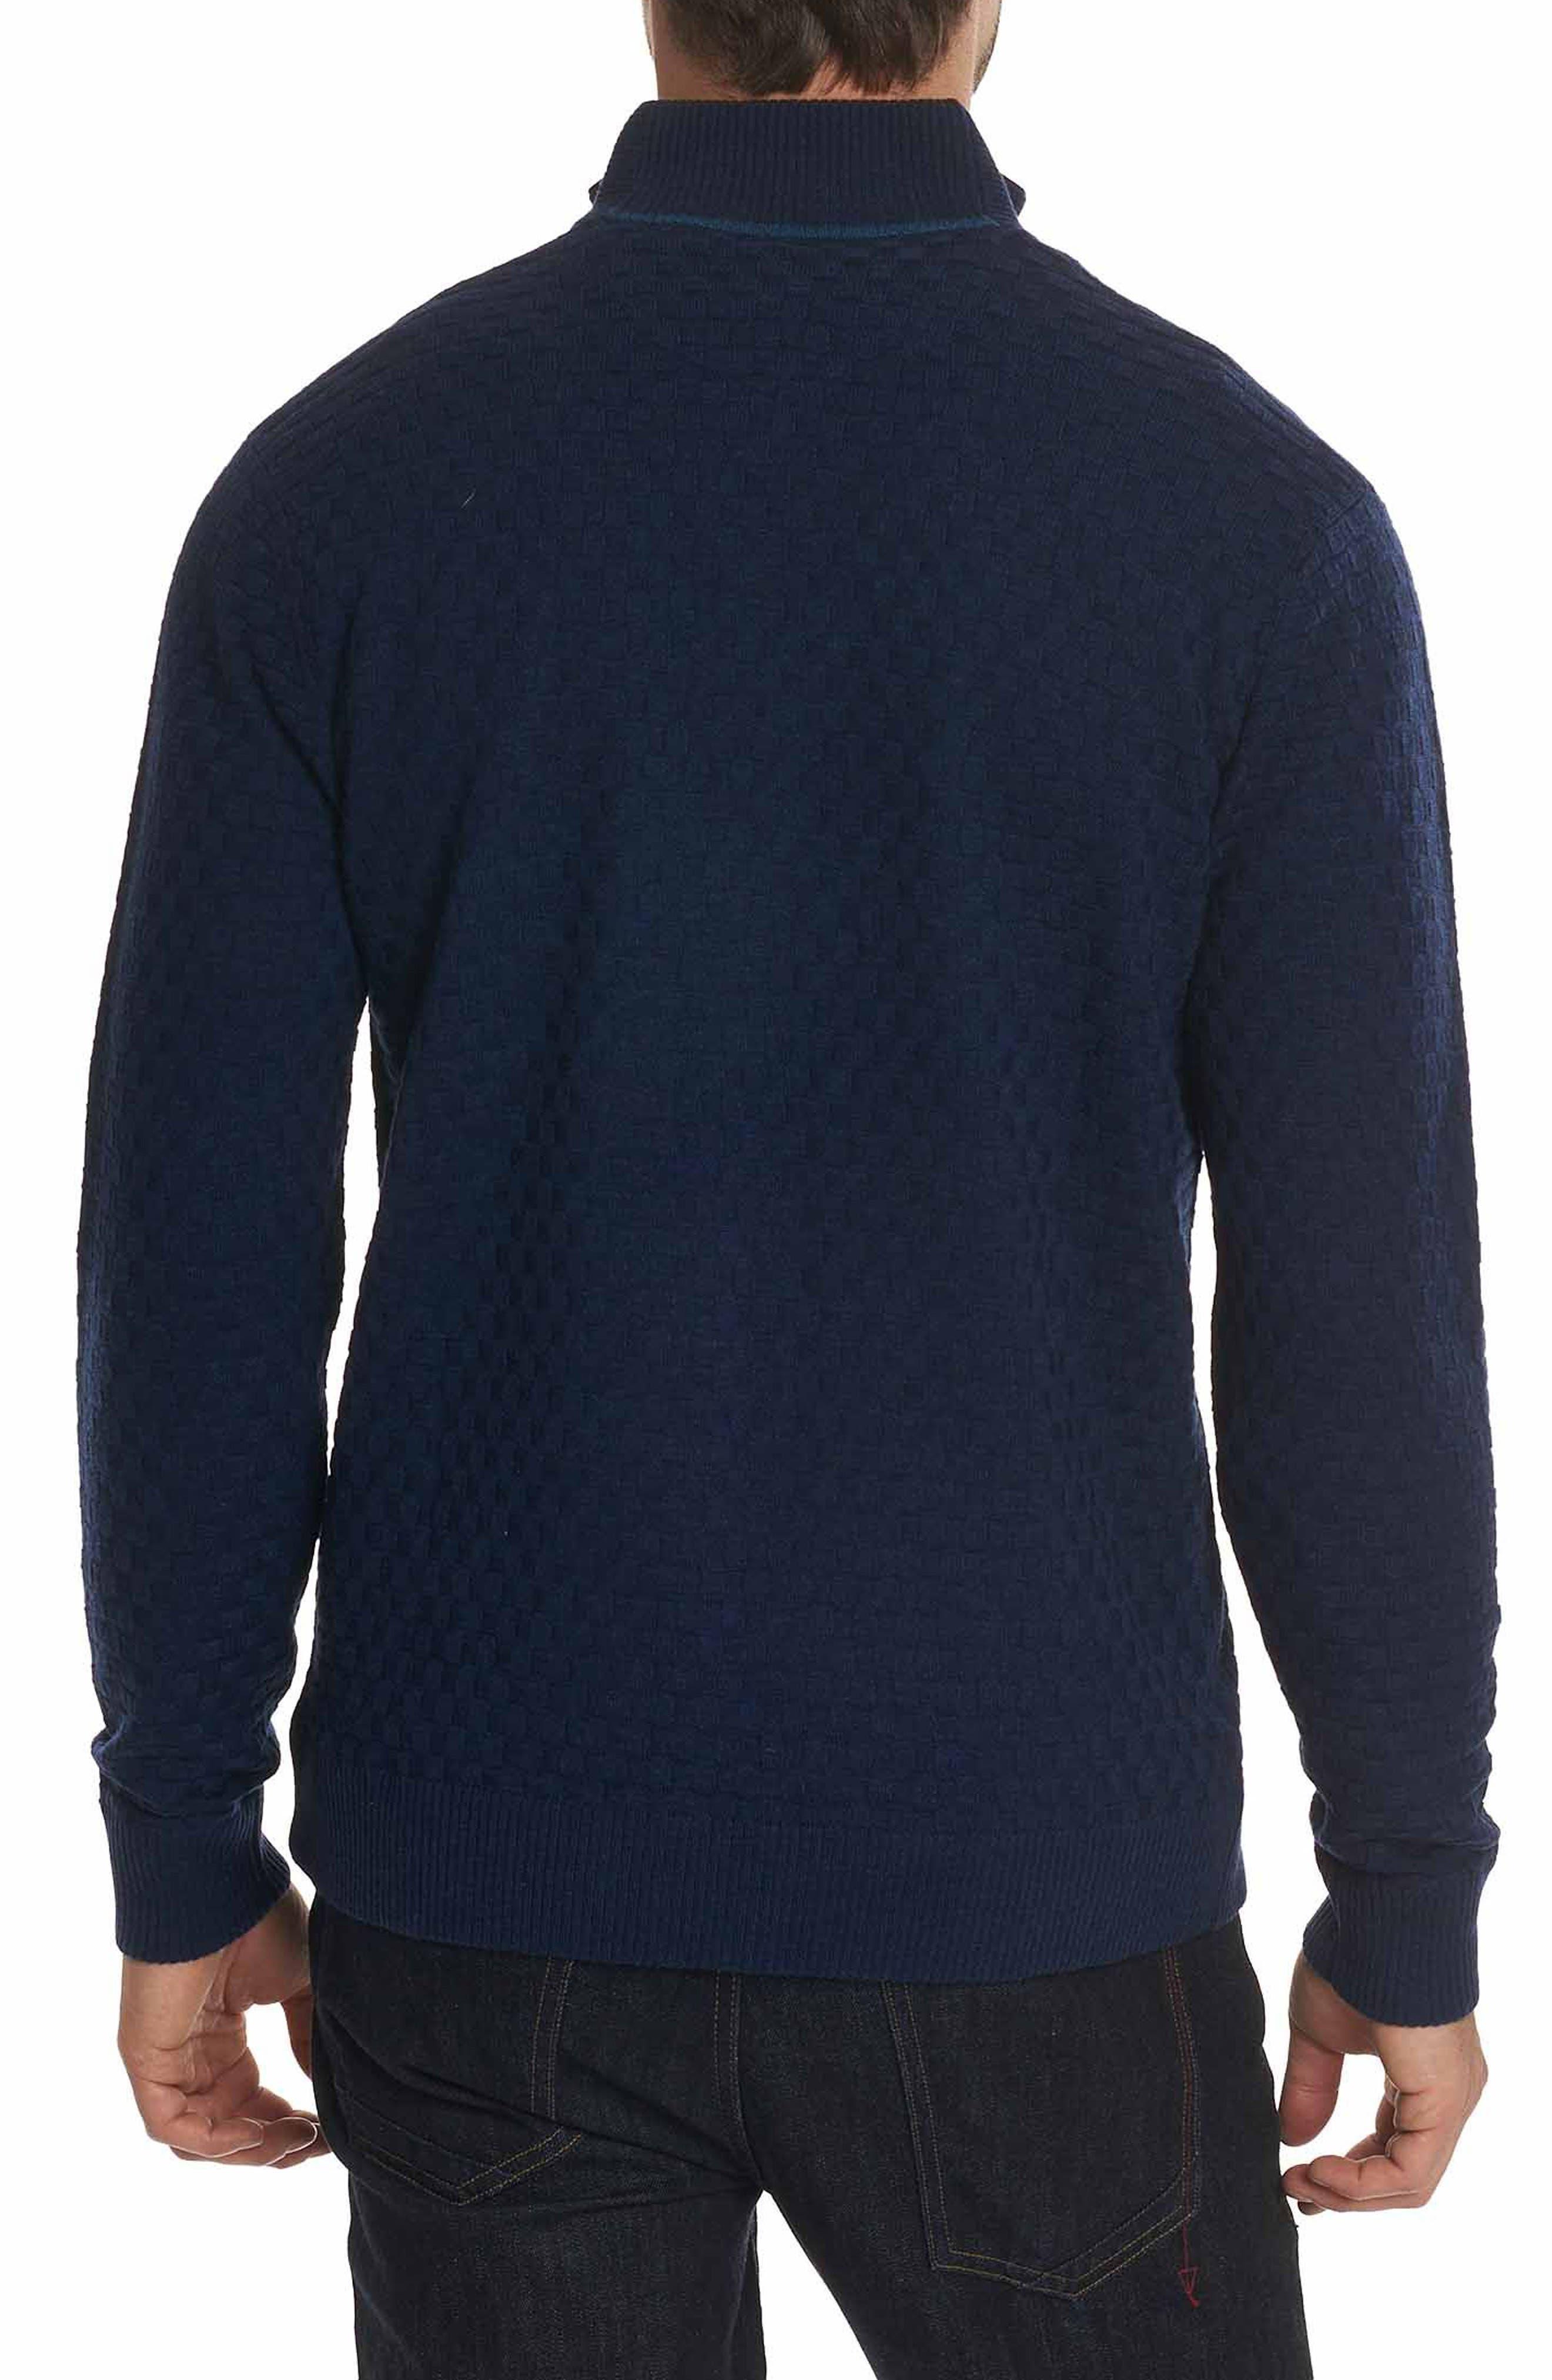 American Beech Wool Sweater,                             Alternate thumbnail 2, color,                             Navy